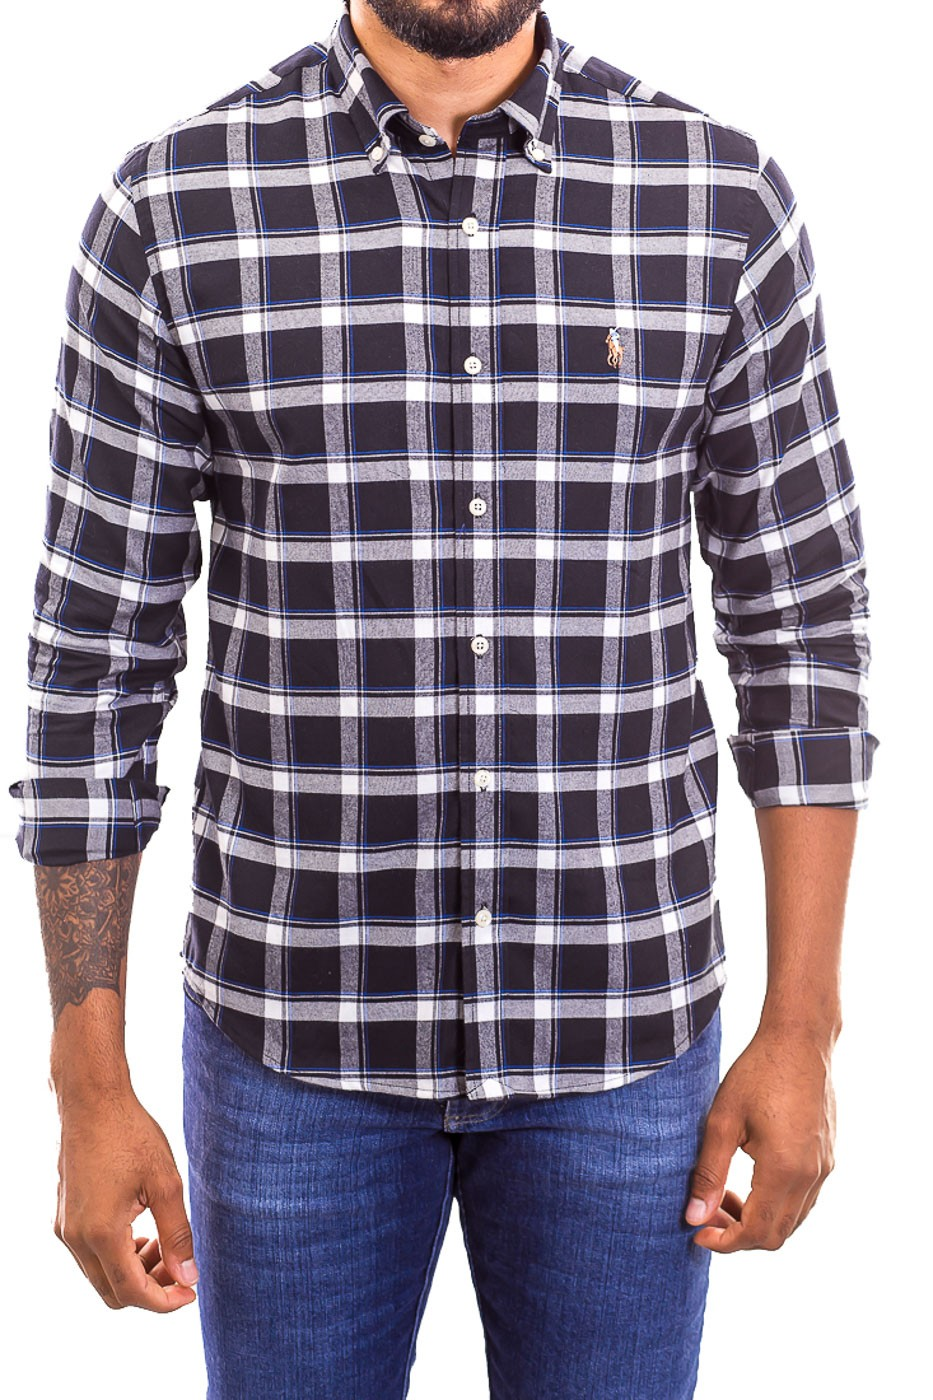 Camisa Ralph Lauren Masculina Custom Fit Colors Icon Check Xadrez Flannel Preto